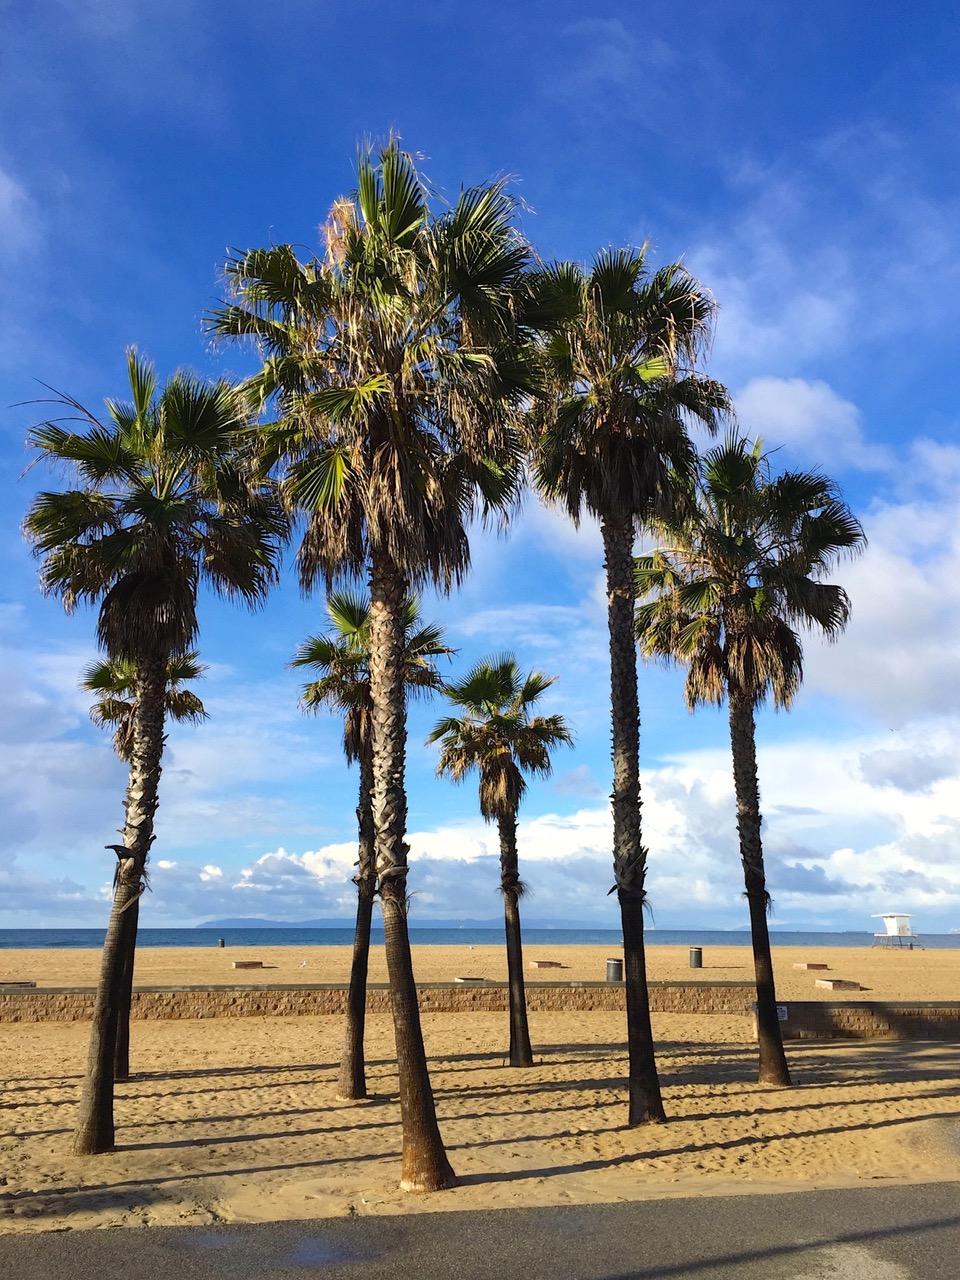 Palm trees at Huntington Beach, USA